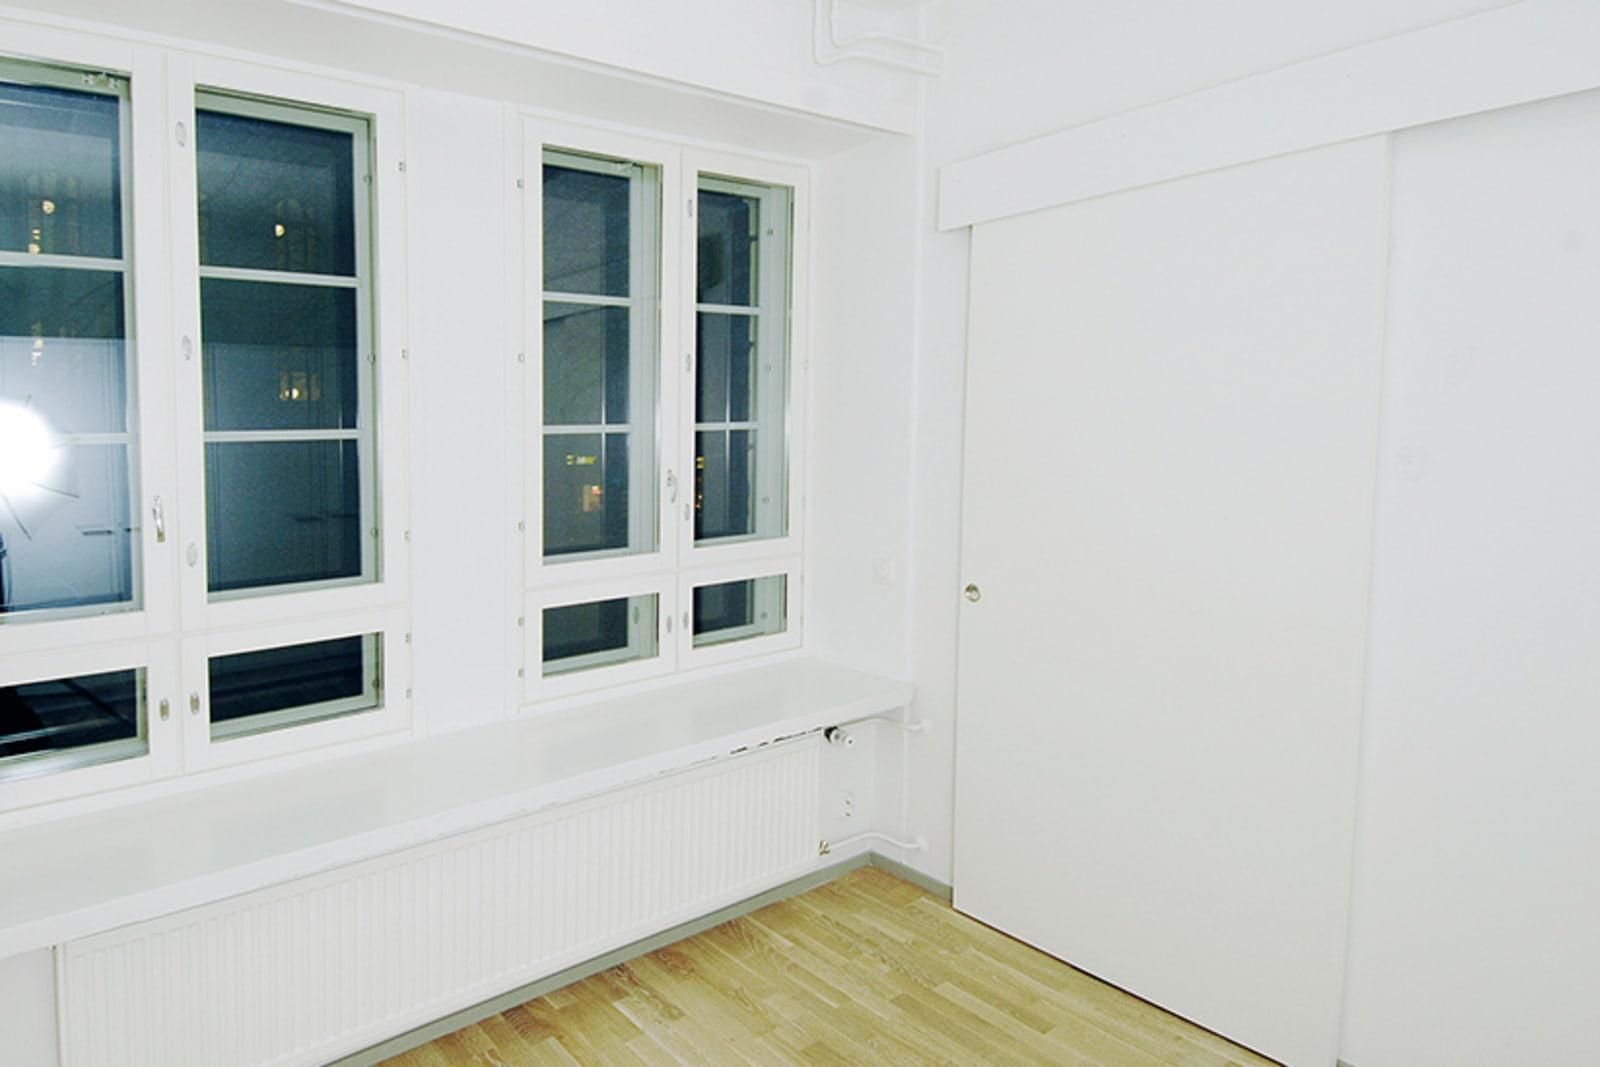 Helsinki, Kamppi, Lönnrotinkatu 32 C 031